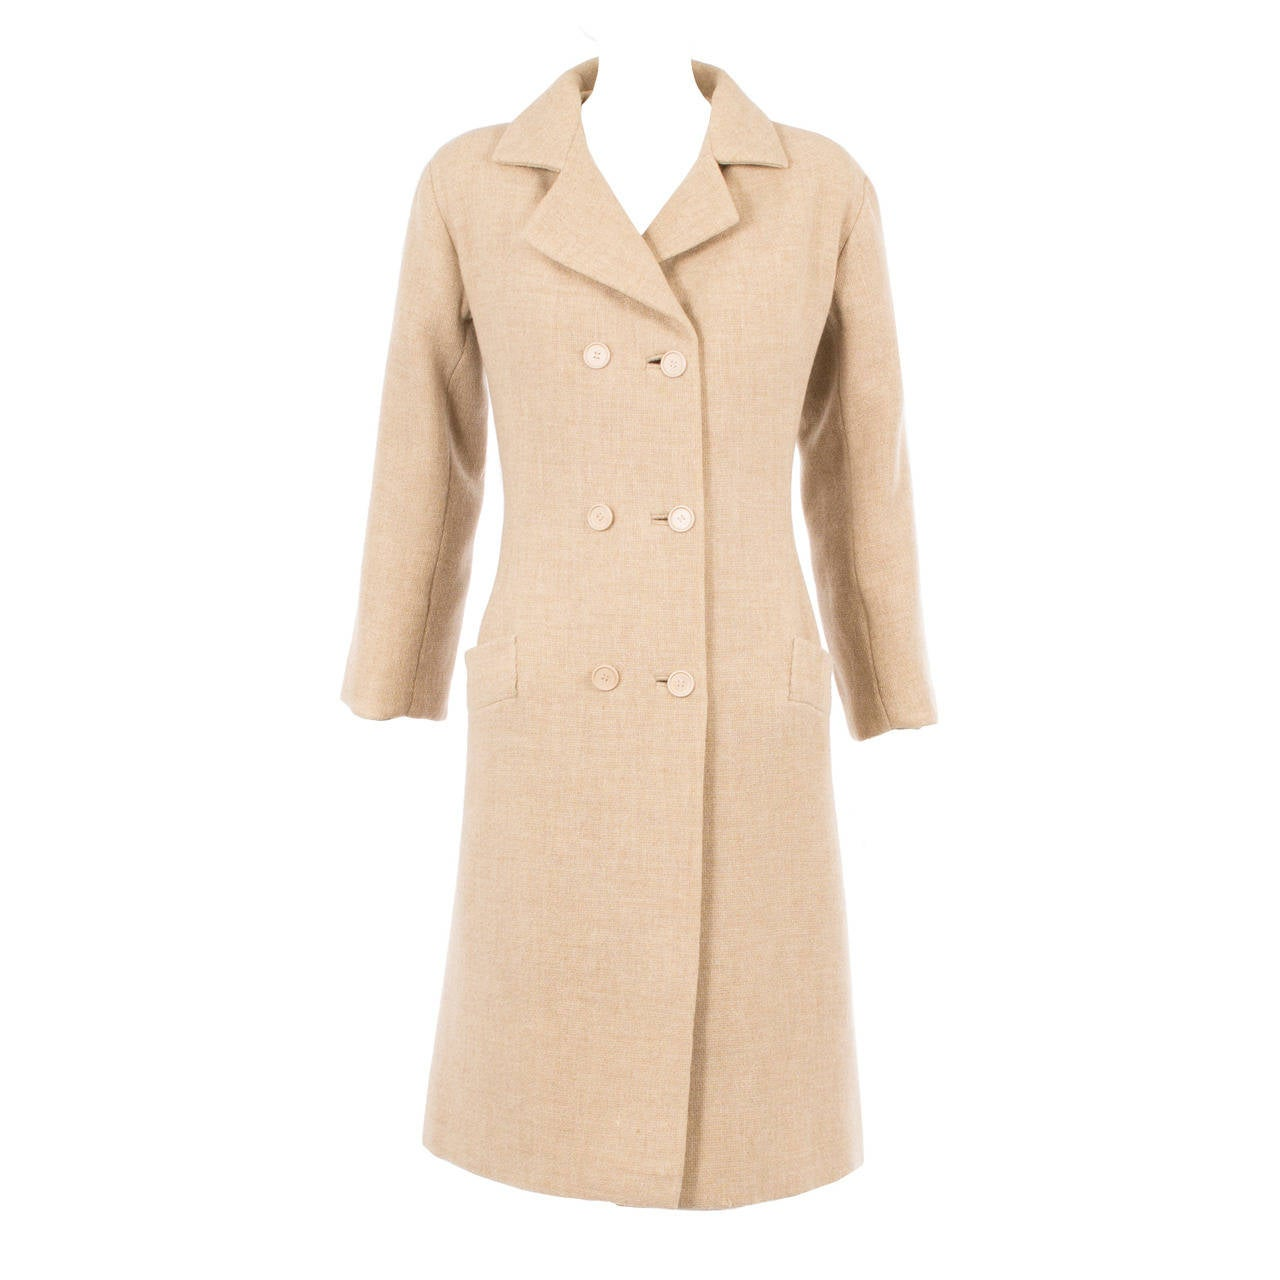 Balenciaga haute couture oatmeal wool coat, circa 1968 For Sale